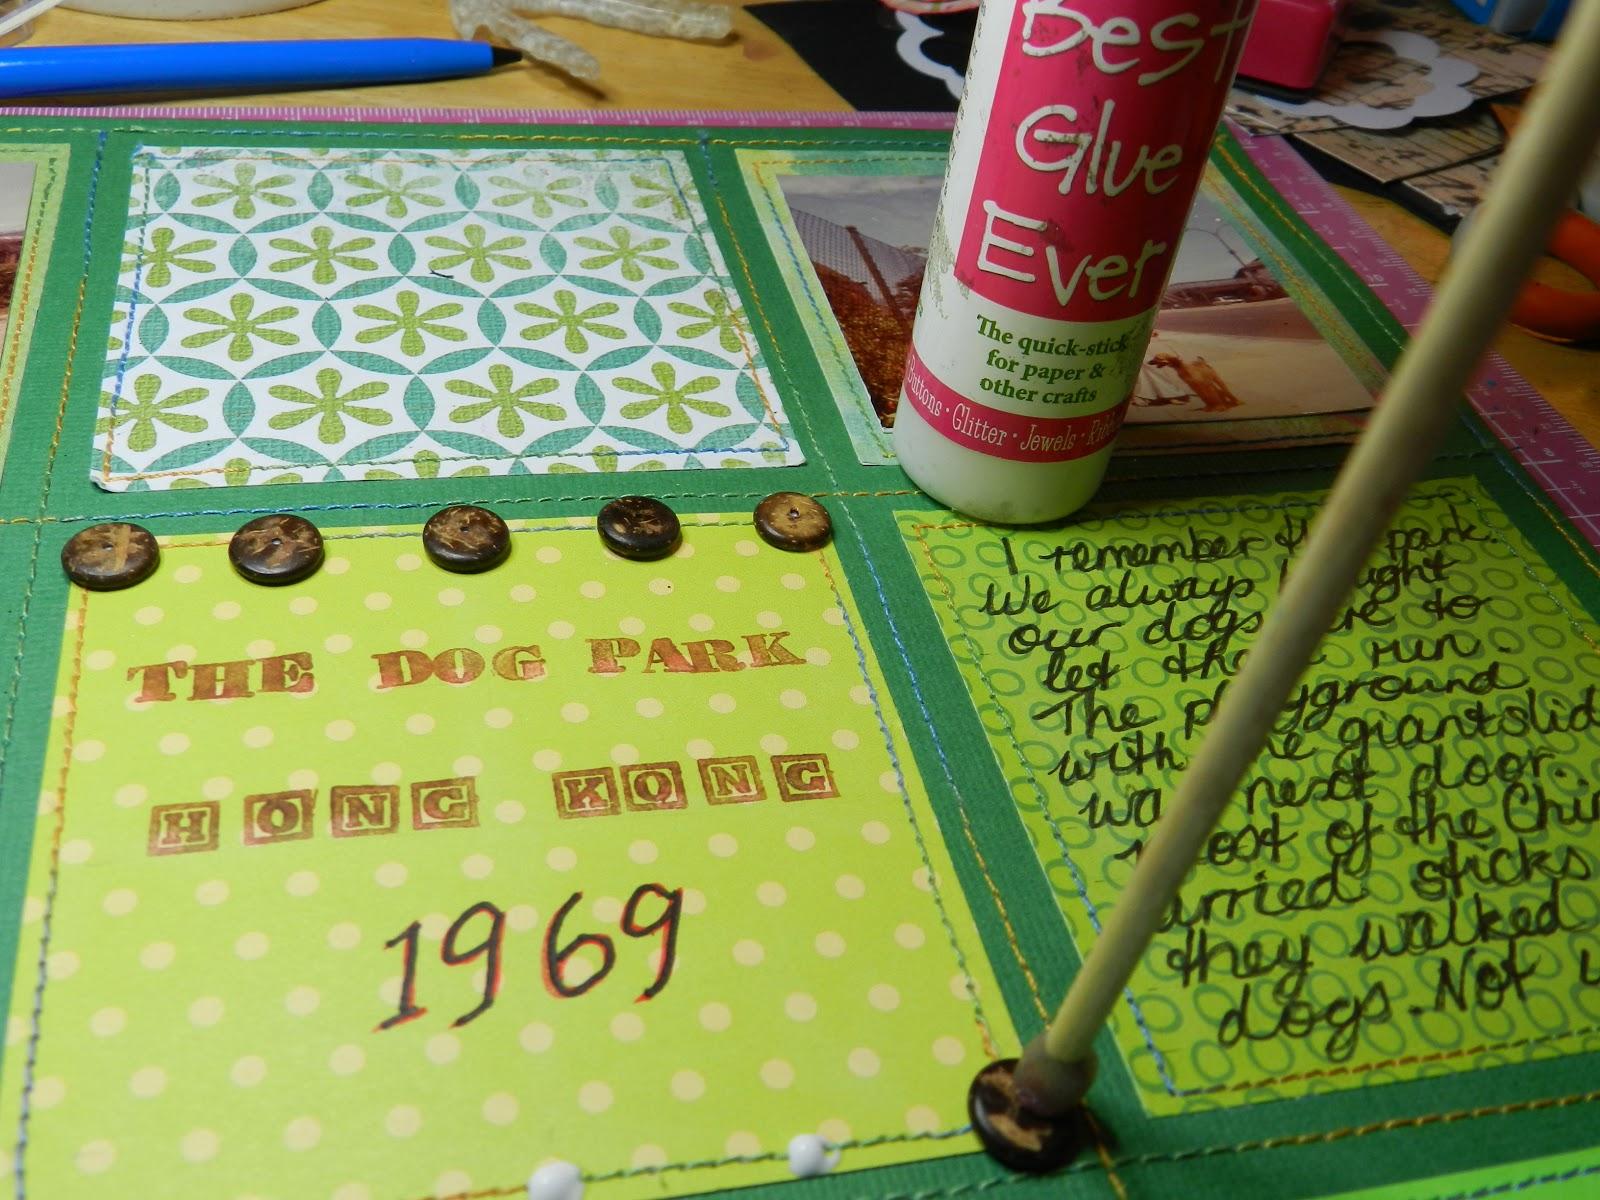 http://2.bp.blogspot.com/-cGE_0Yw_fVg/Th5jZCq8_xI/AAAAAAAACl4/nRpaRT1-7xw/s1600/Using+glue+%2526+Embellie+Gellie.JPG